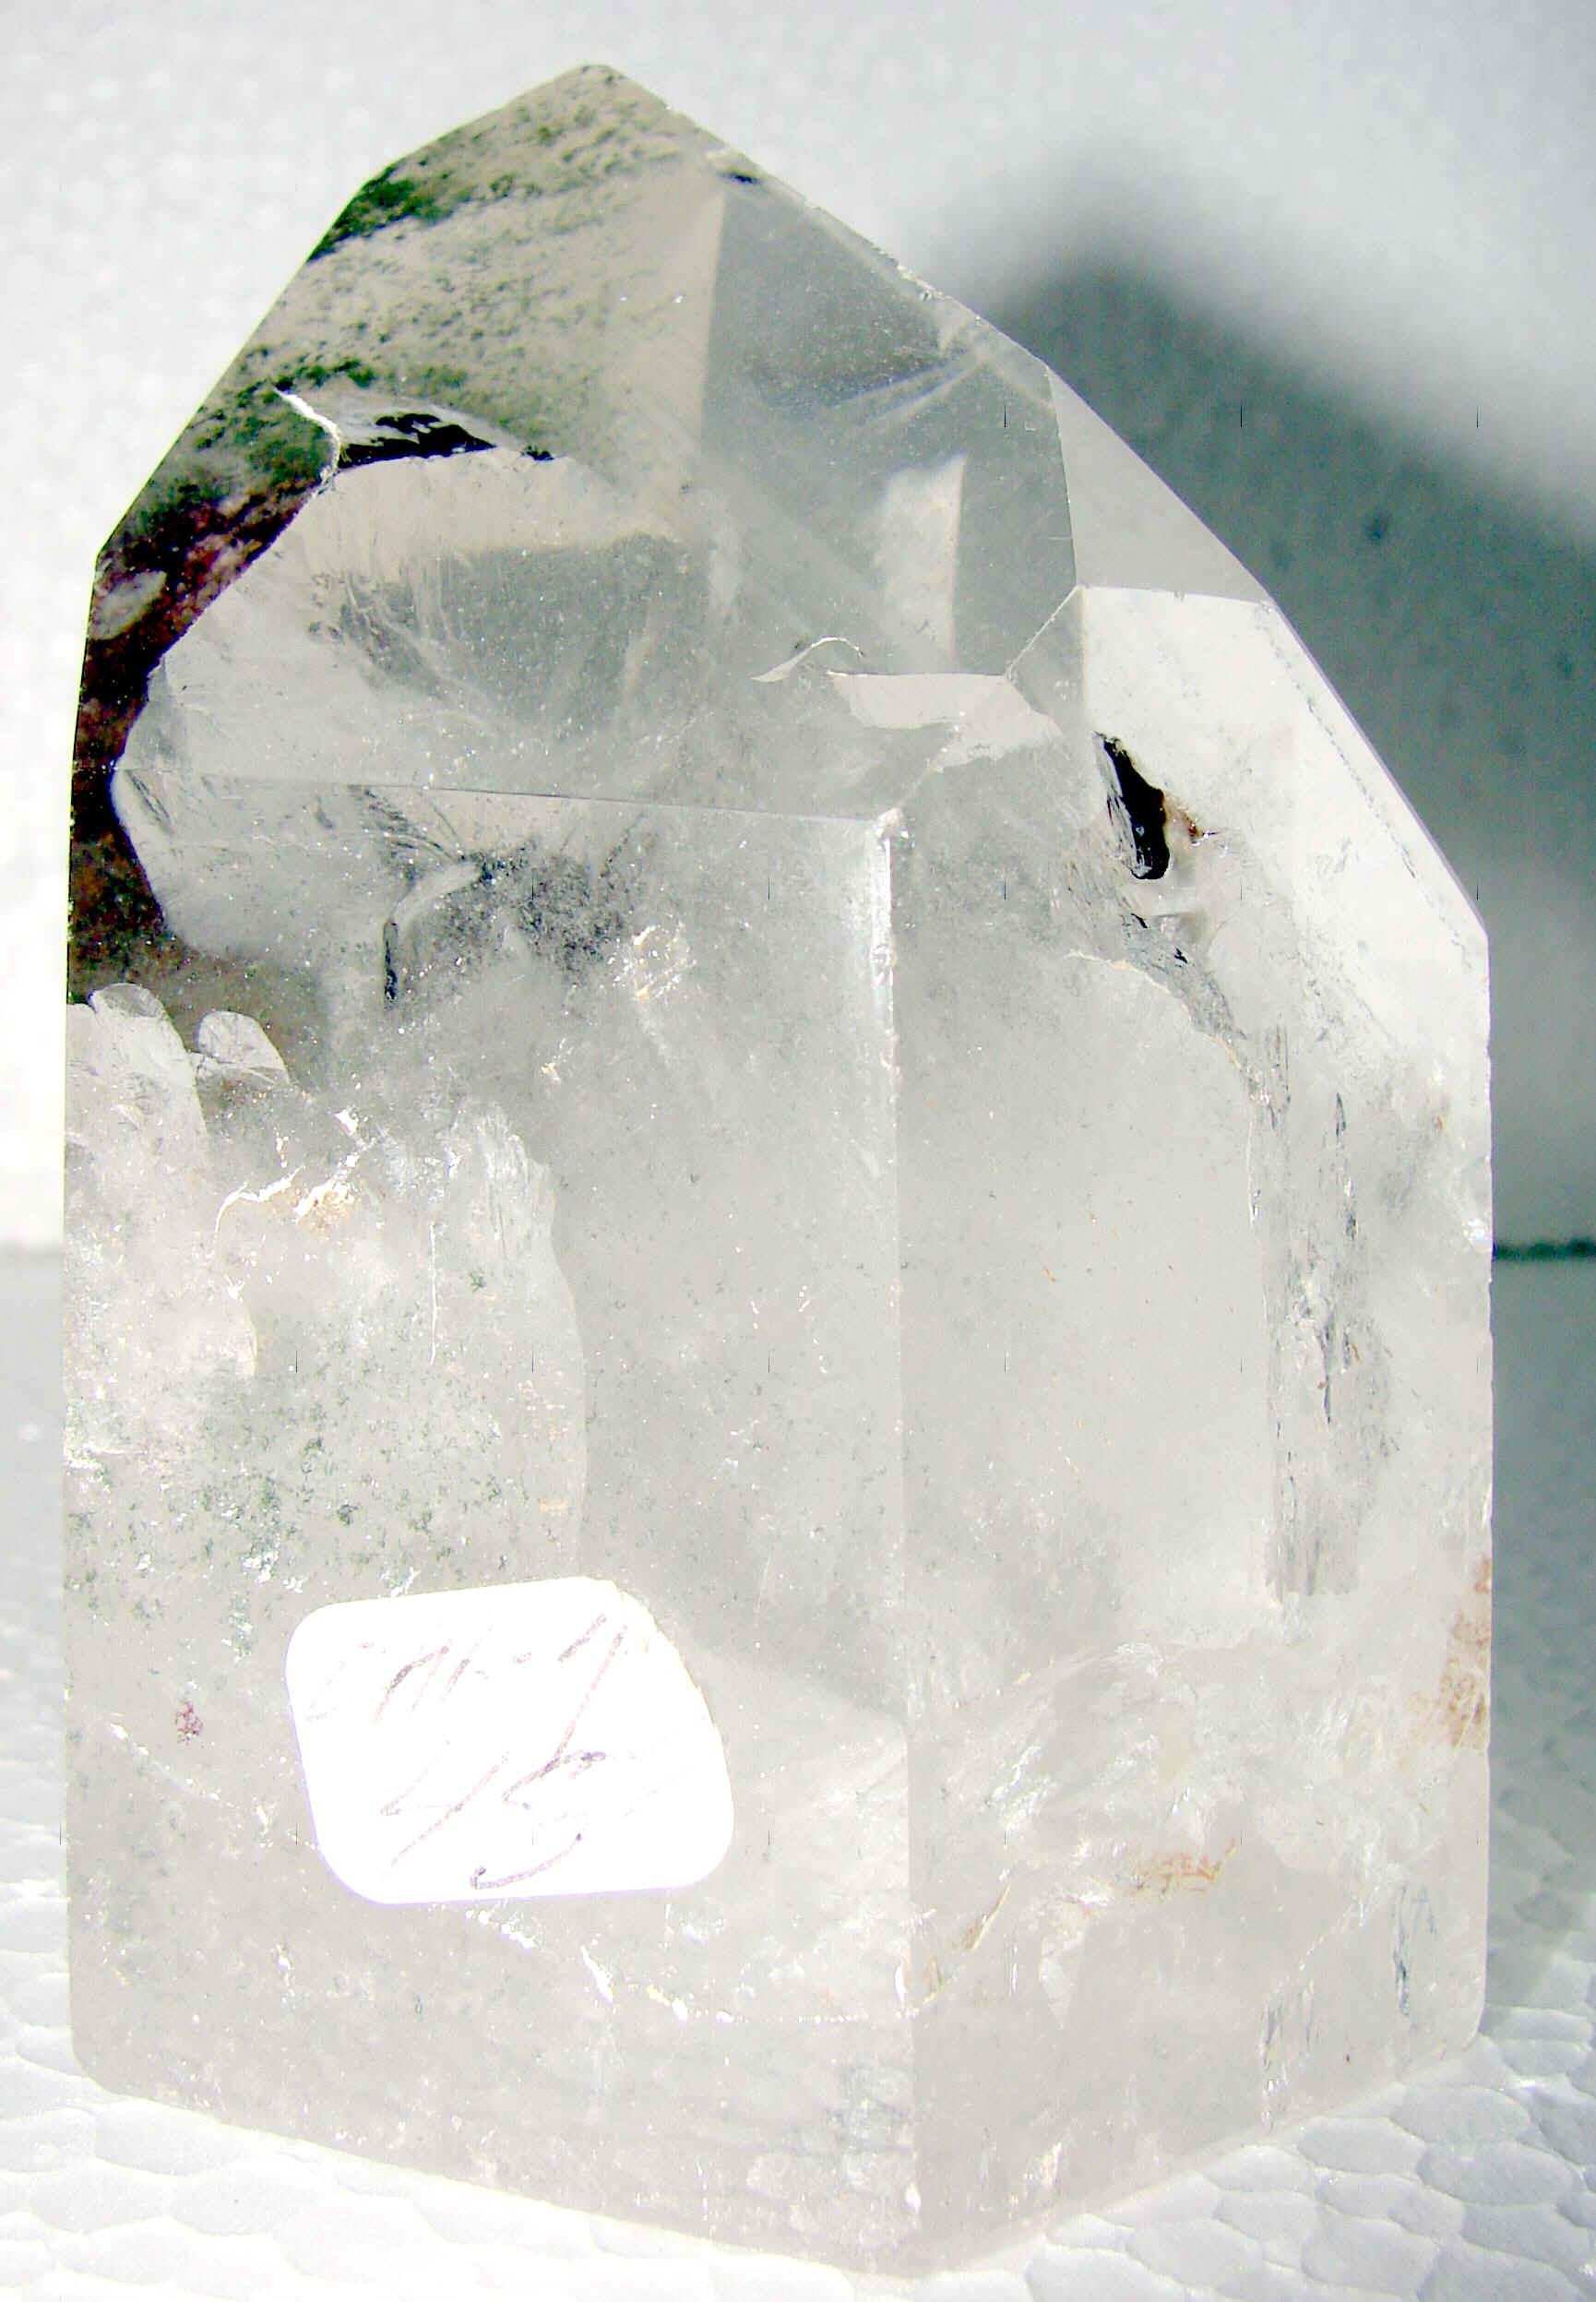 http://www.quartzcrystals.net/nuchl-6.jpg (807370 bytes)